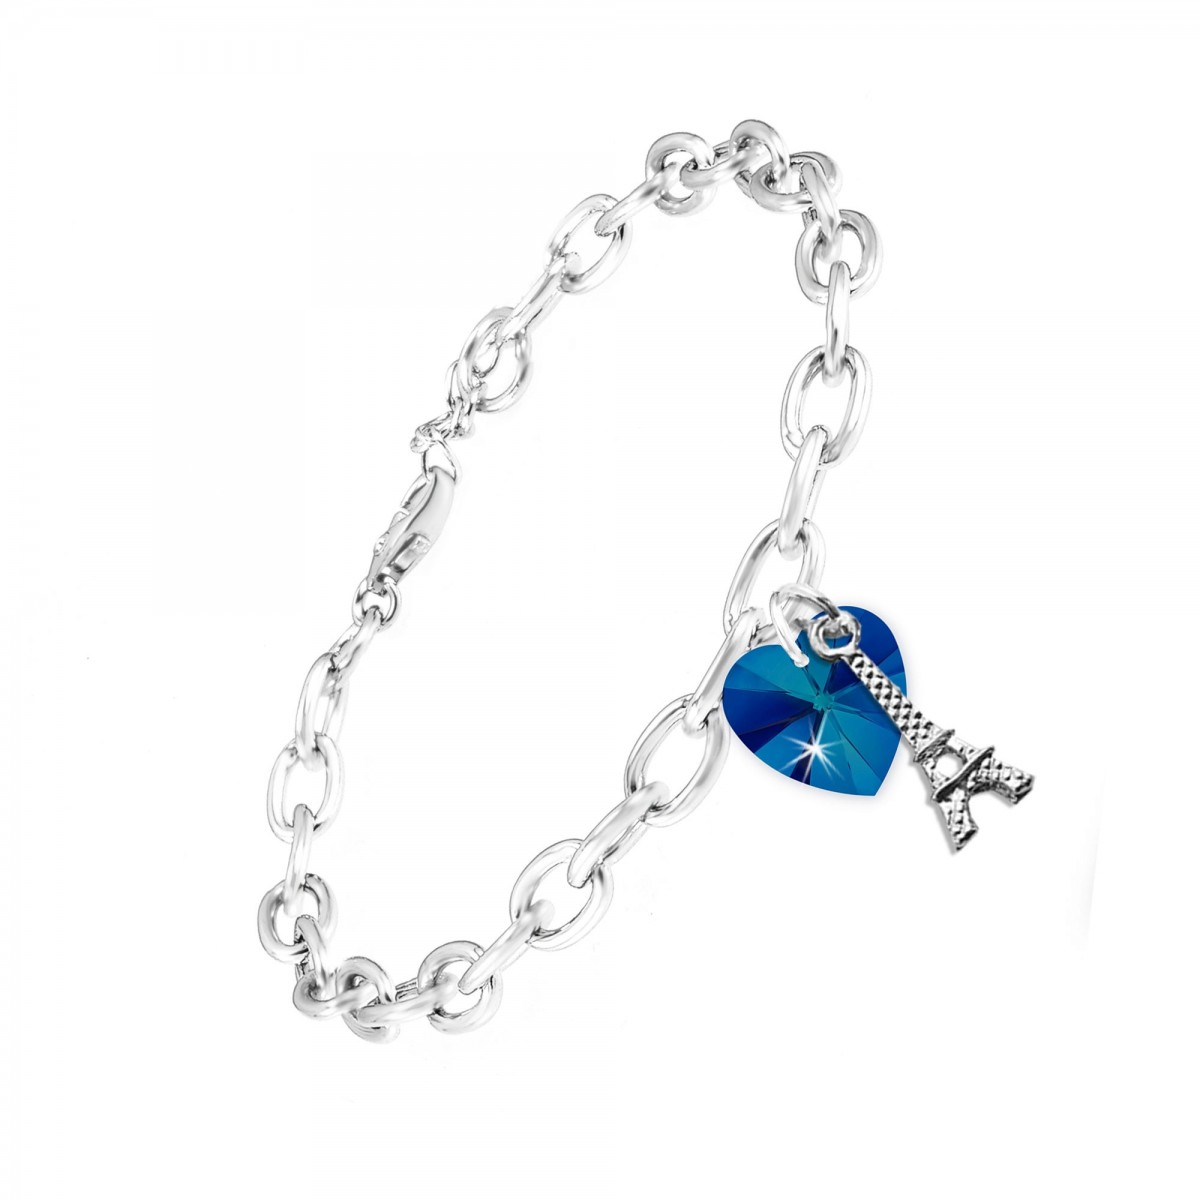 Bracelet argenté Tour Eiffel So Charm orné d'un coeur made with crystals from Swarovski bermuda blue